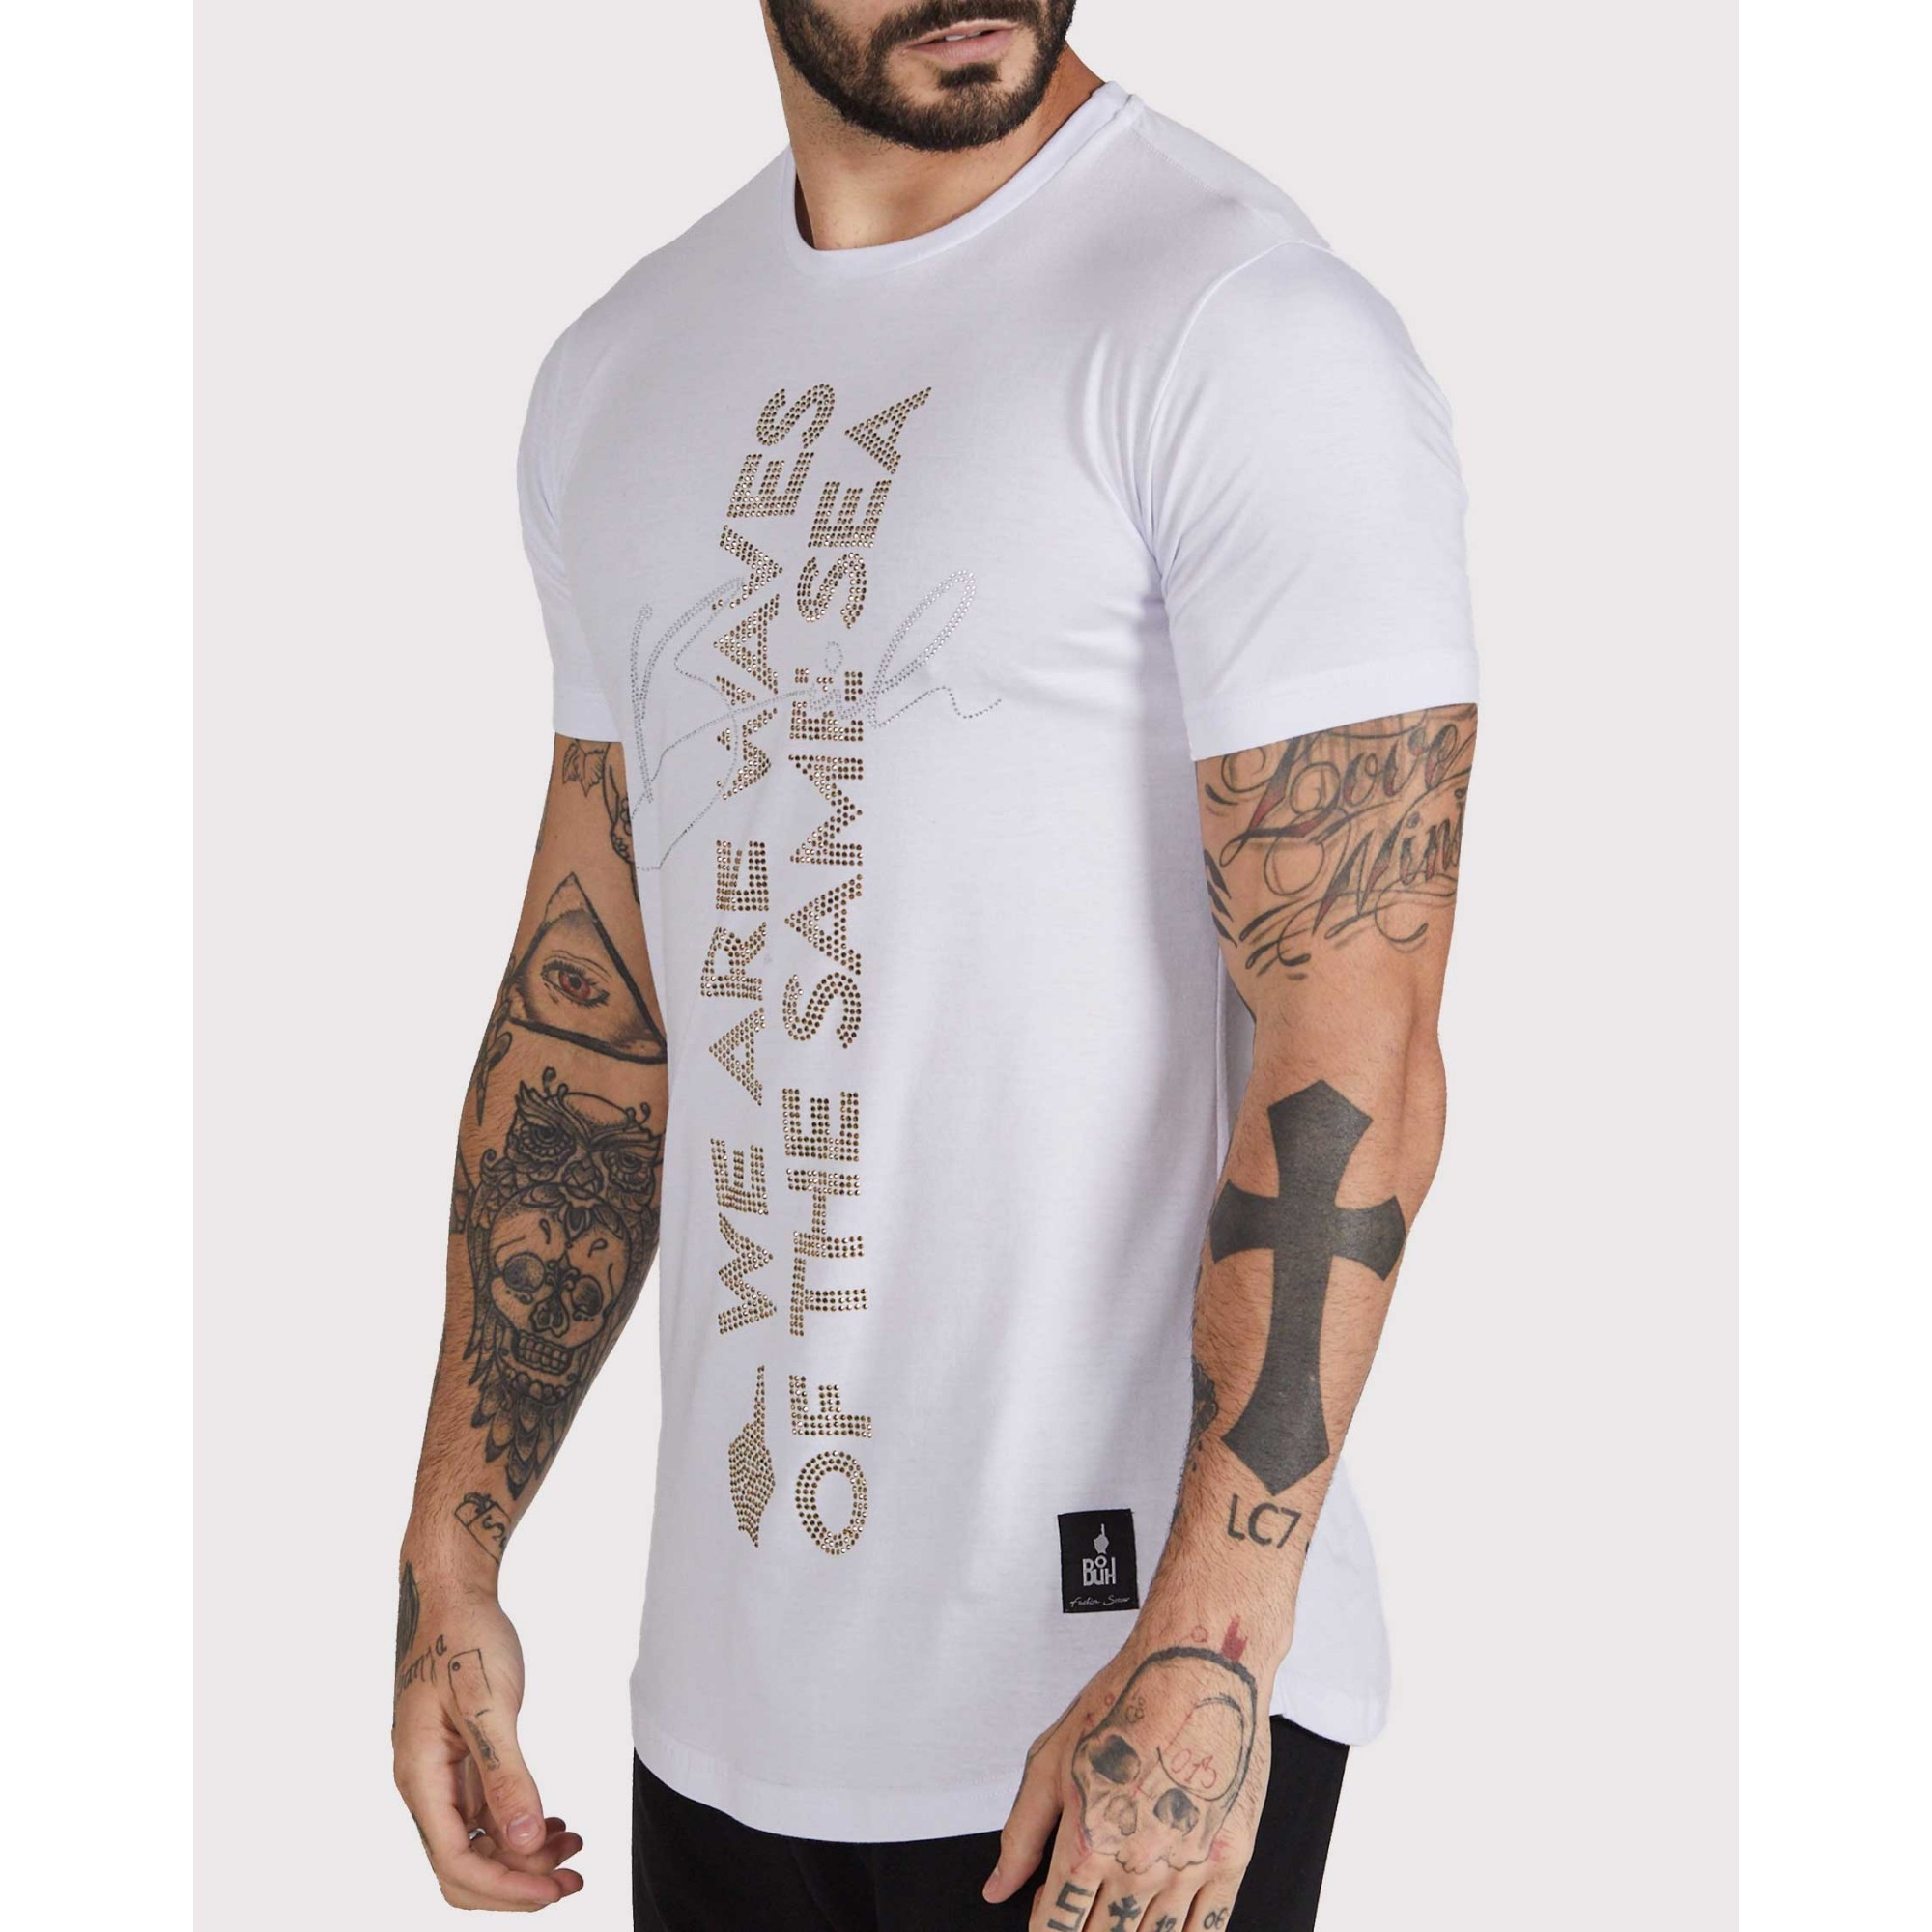 Camiseta Buh Same Shine White